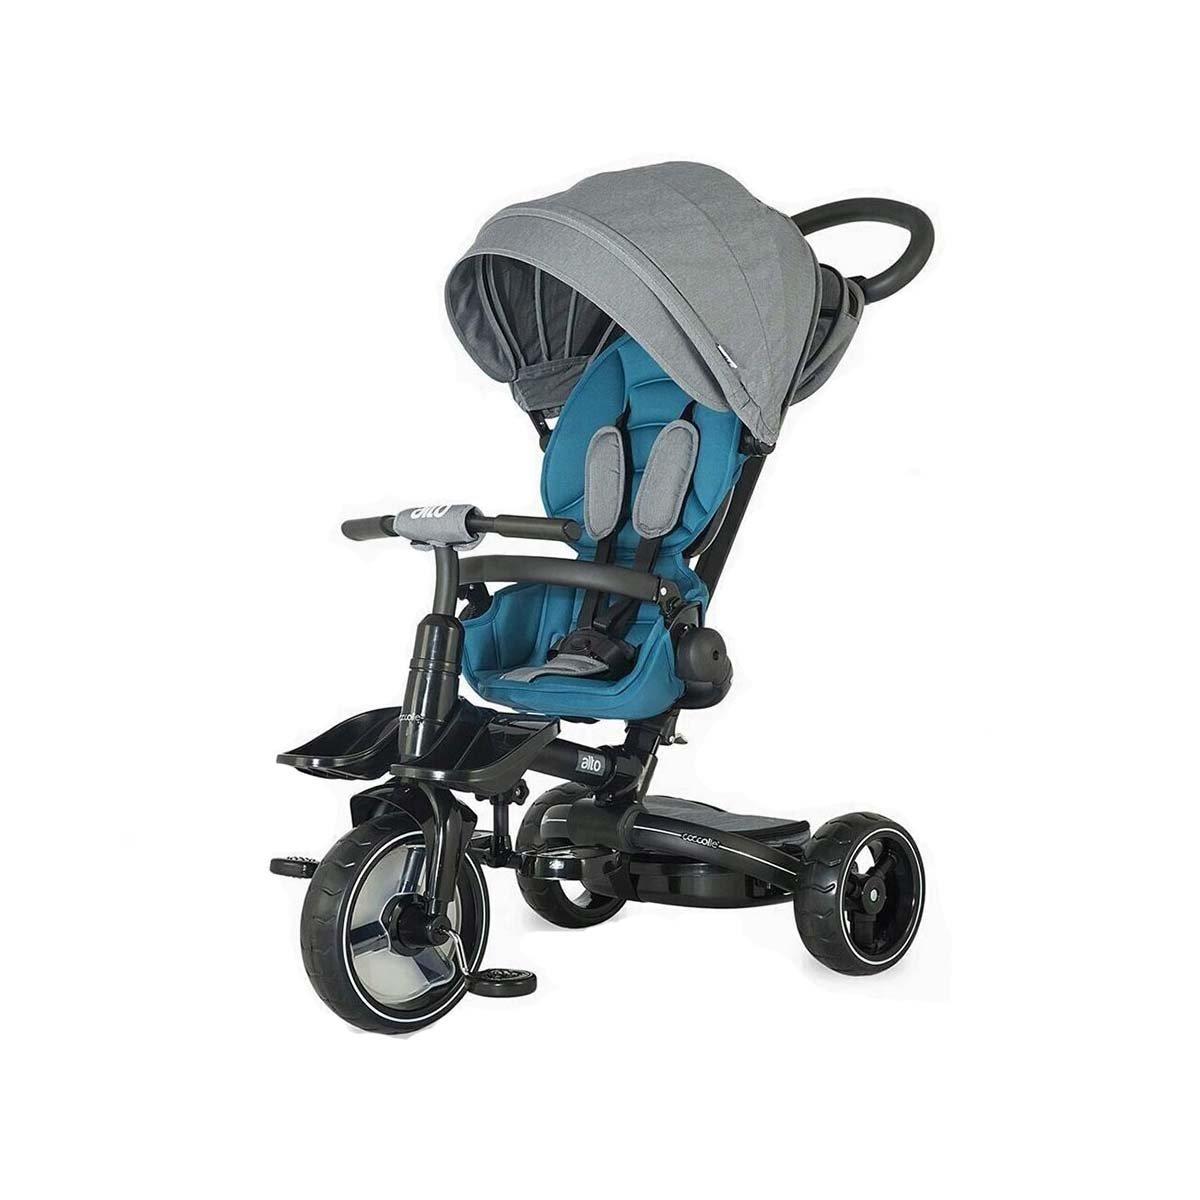 Tricicleta multifunctionala Alto Coccolle, Albastru imagine